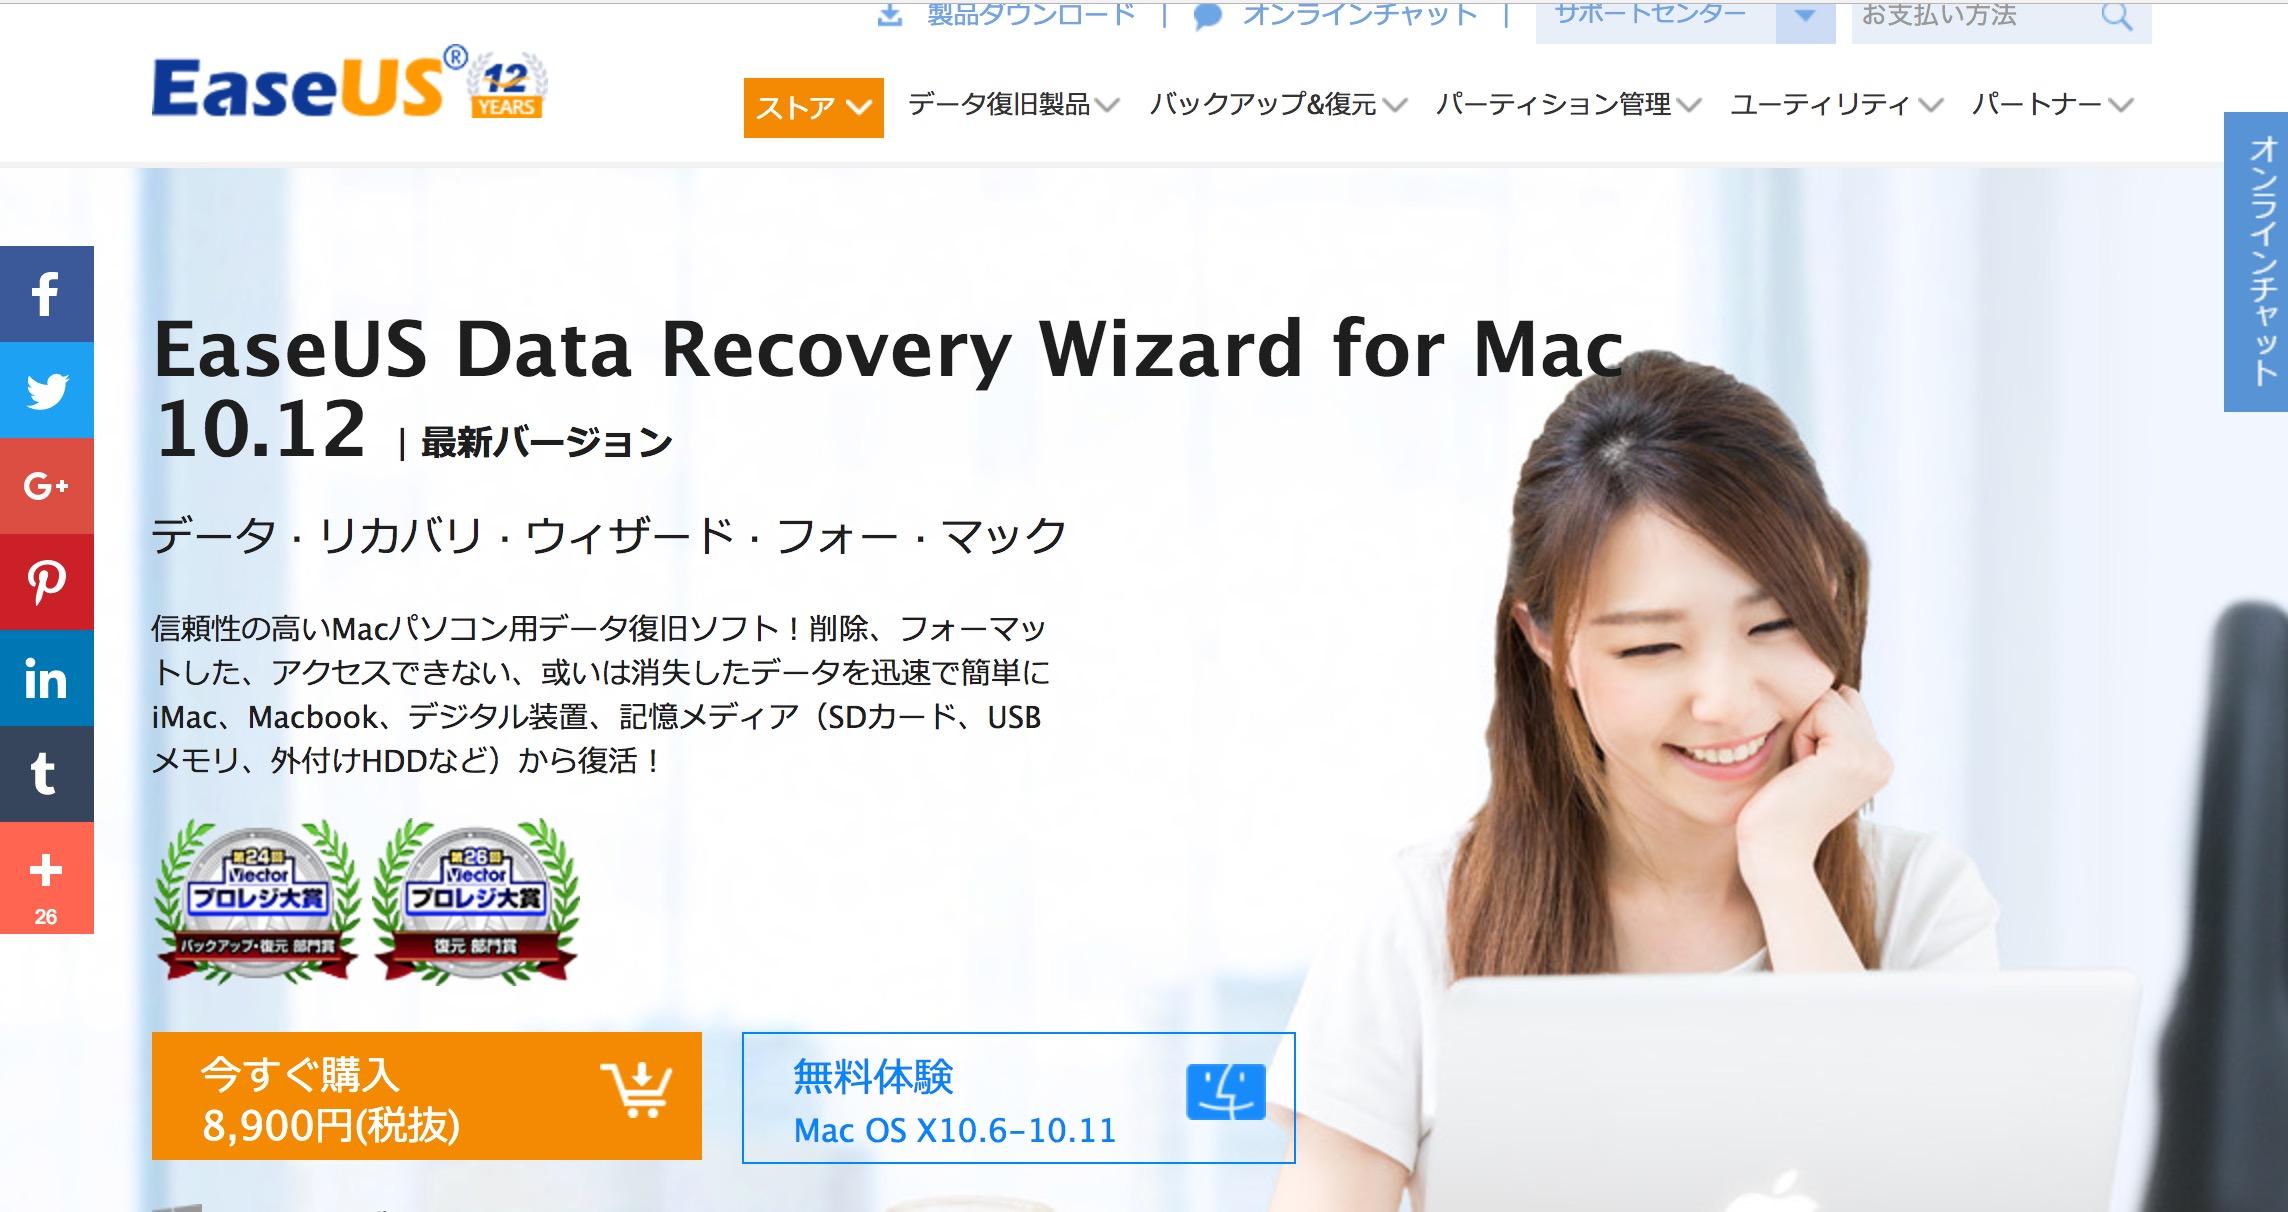 macでデータ復元するならeaseus data recovery wizard for macがおすすめって話